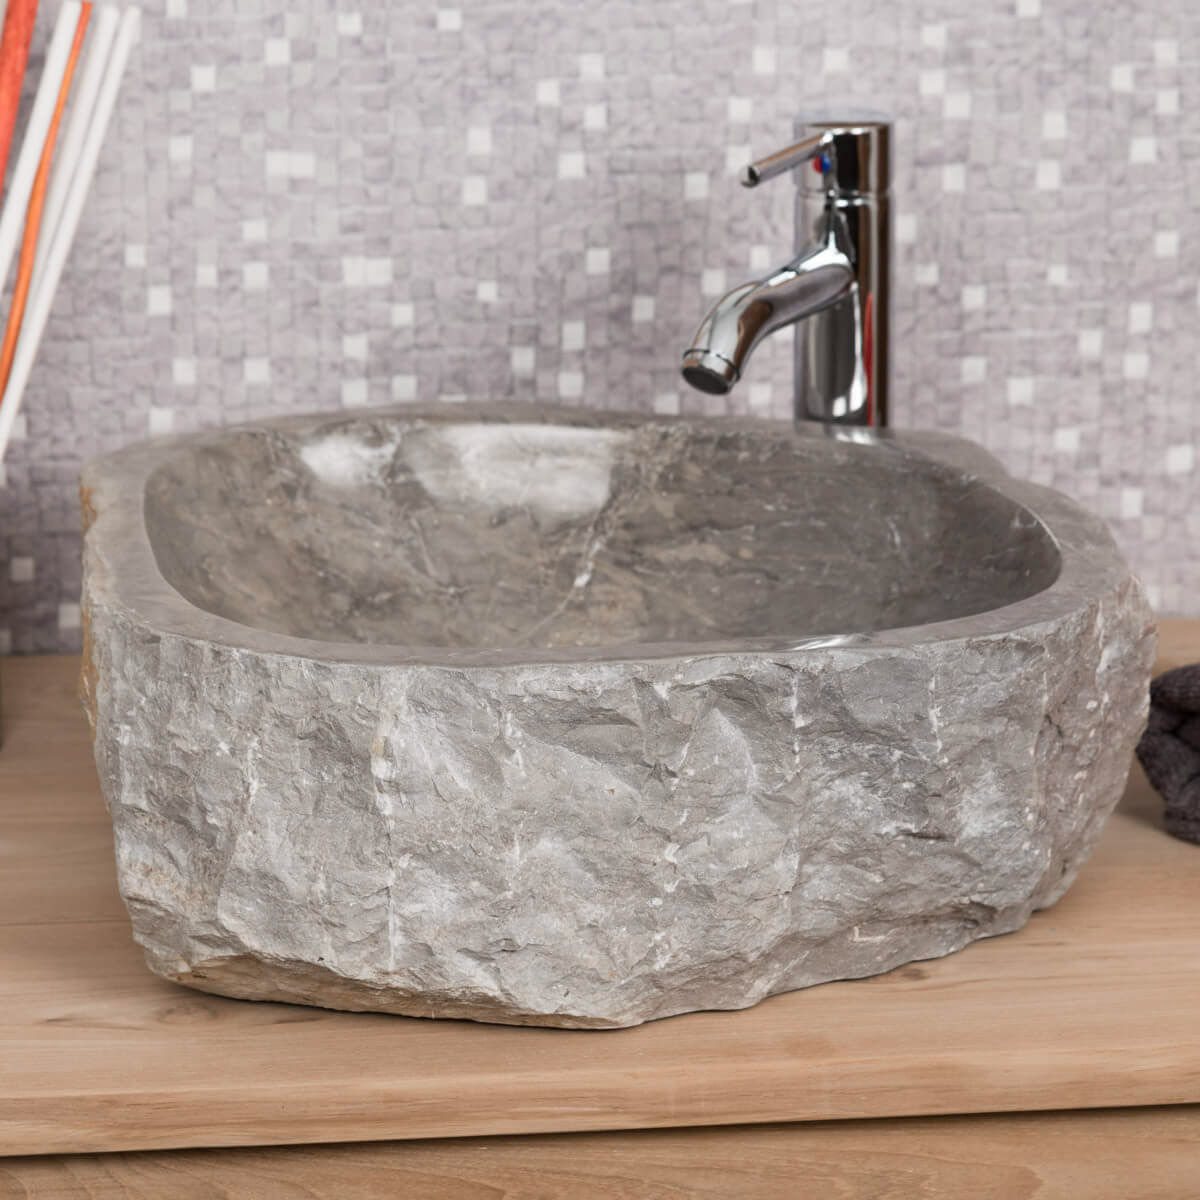 Grande vasque de salle de bain poser roc en marbre gris - Meuble salle de bain vasque a poser ...